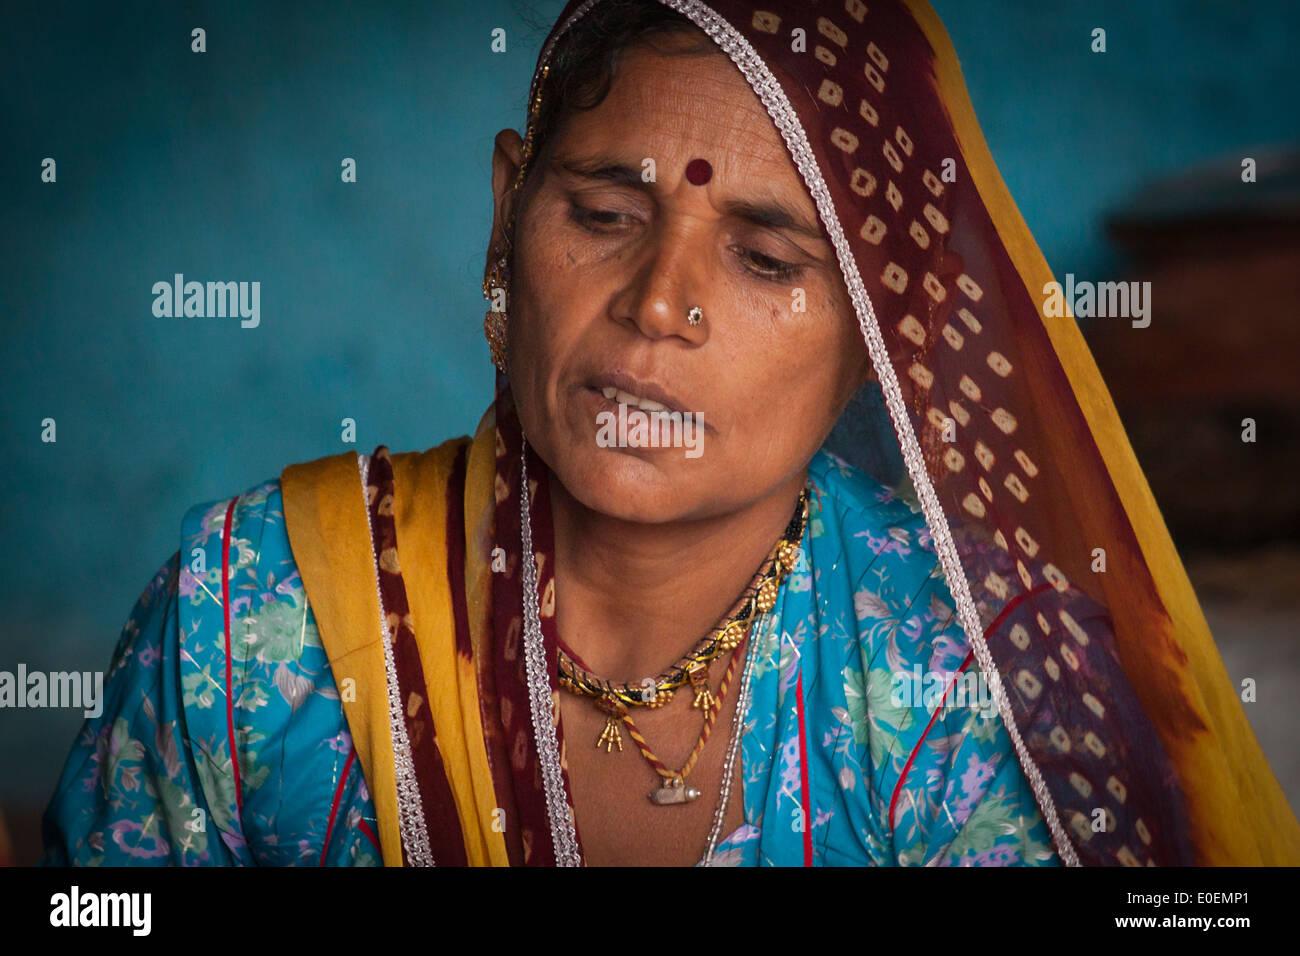 India, Rajasthan, Brahman village, woman in traditional dress - Stock Image